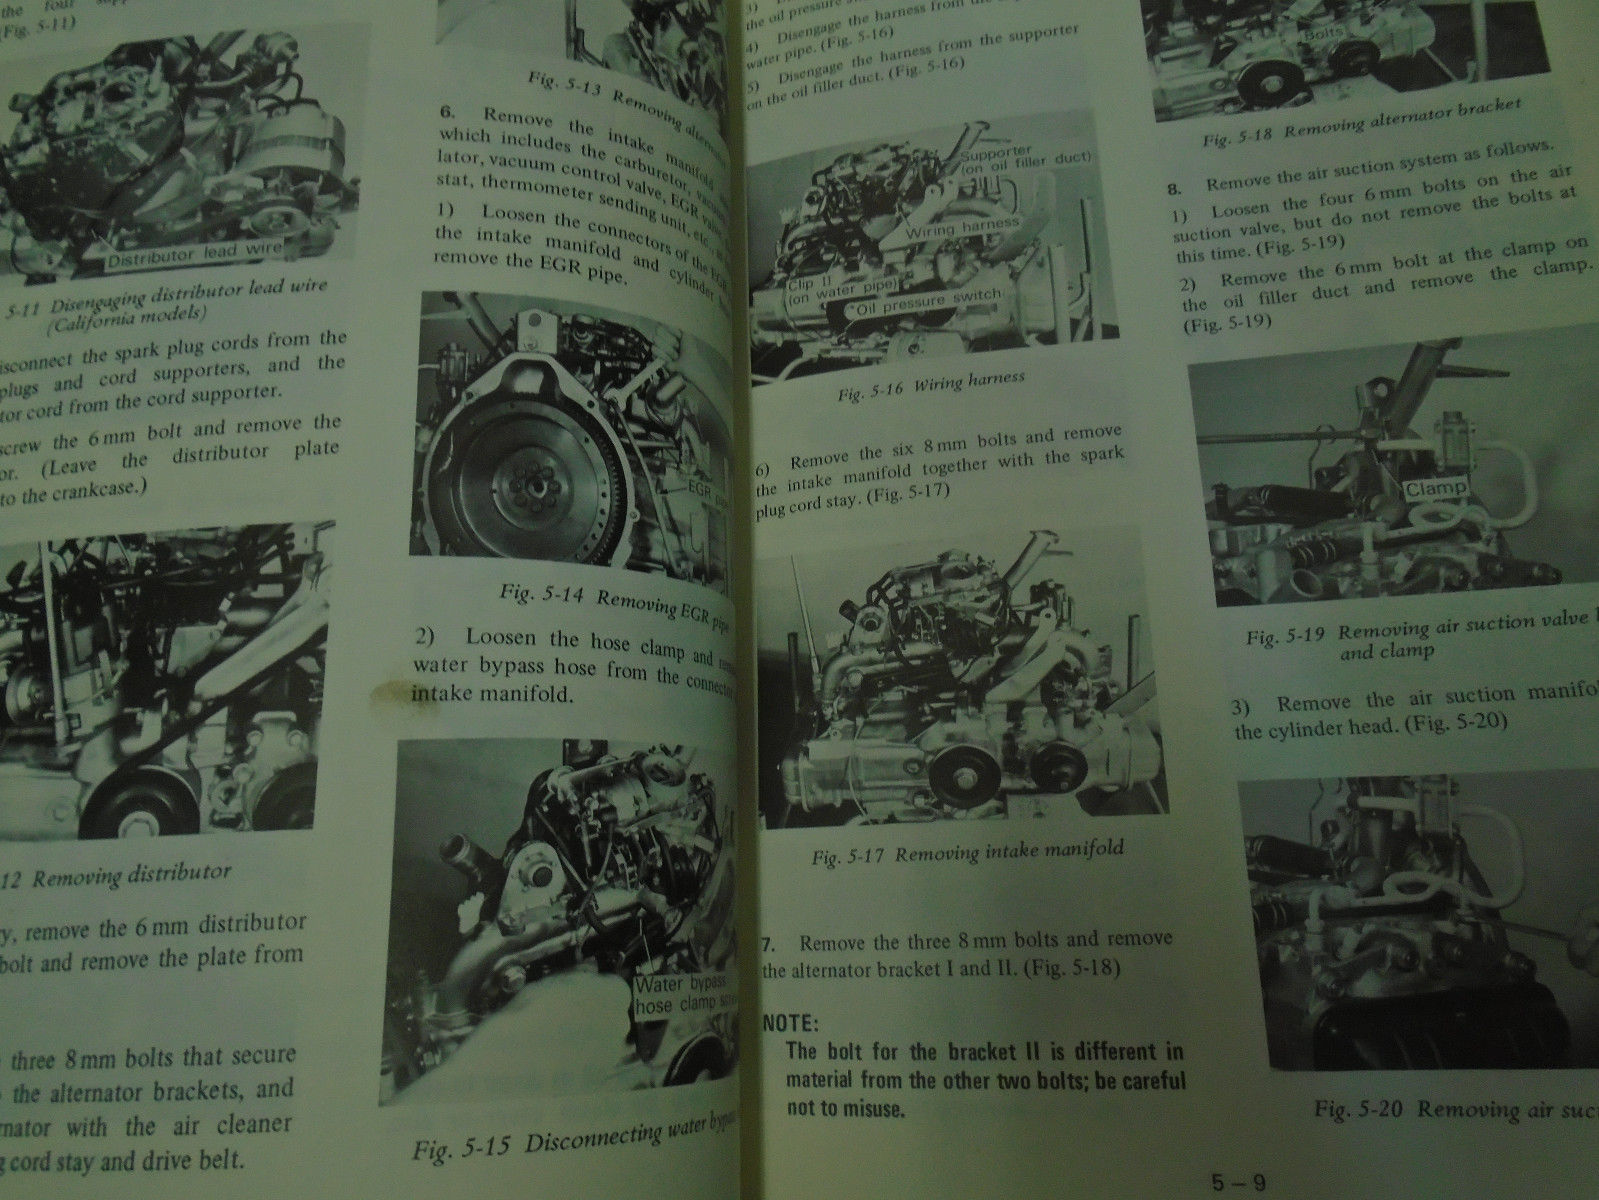 1977 Subaru 1600 Service Repair Shop Manual Set FACTORY OEM BOOKS Used Damaged